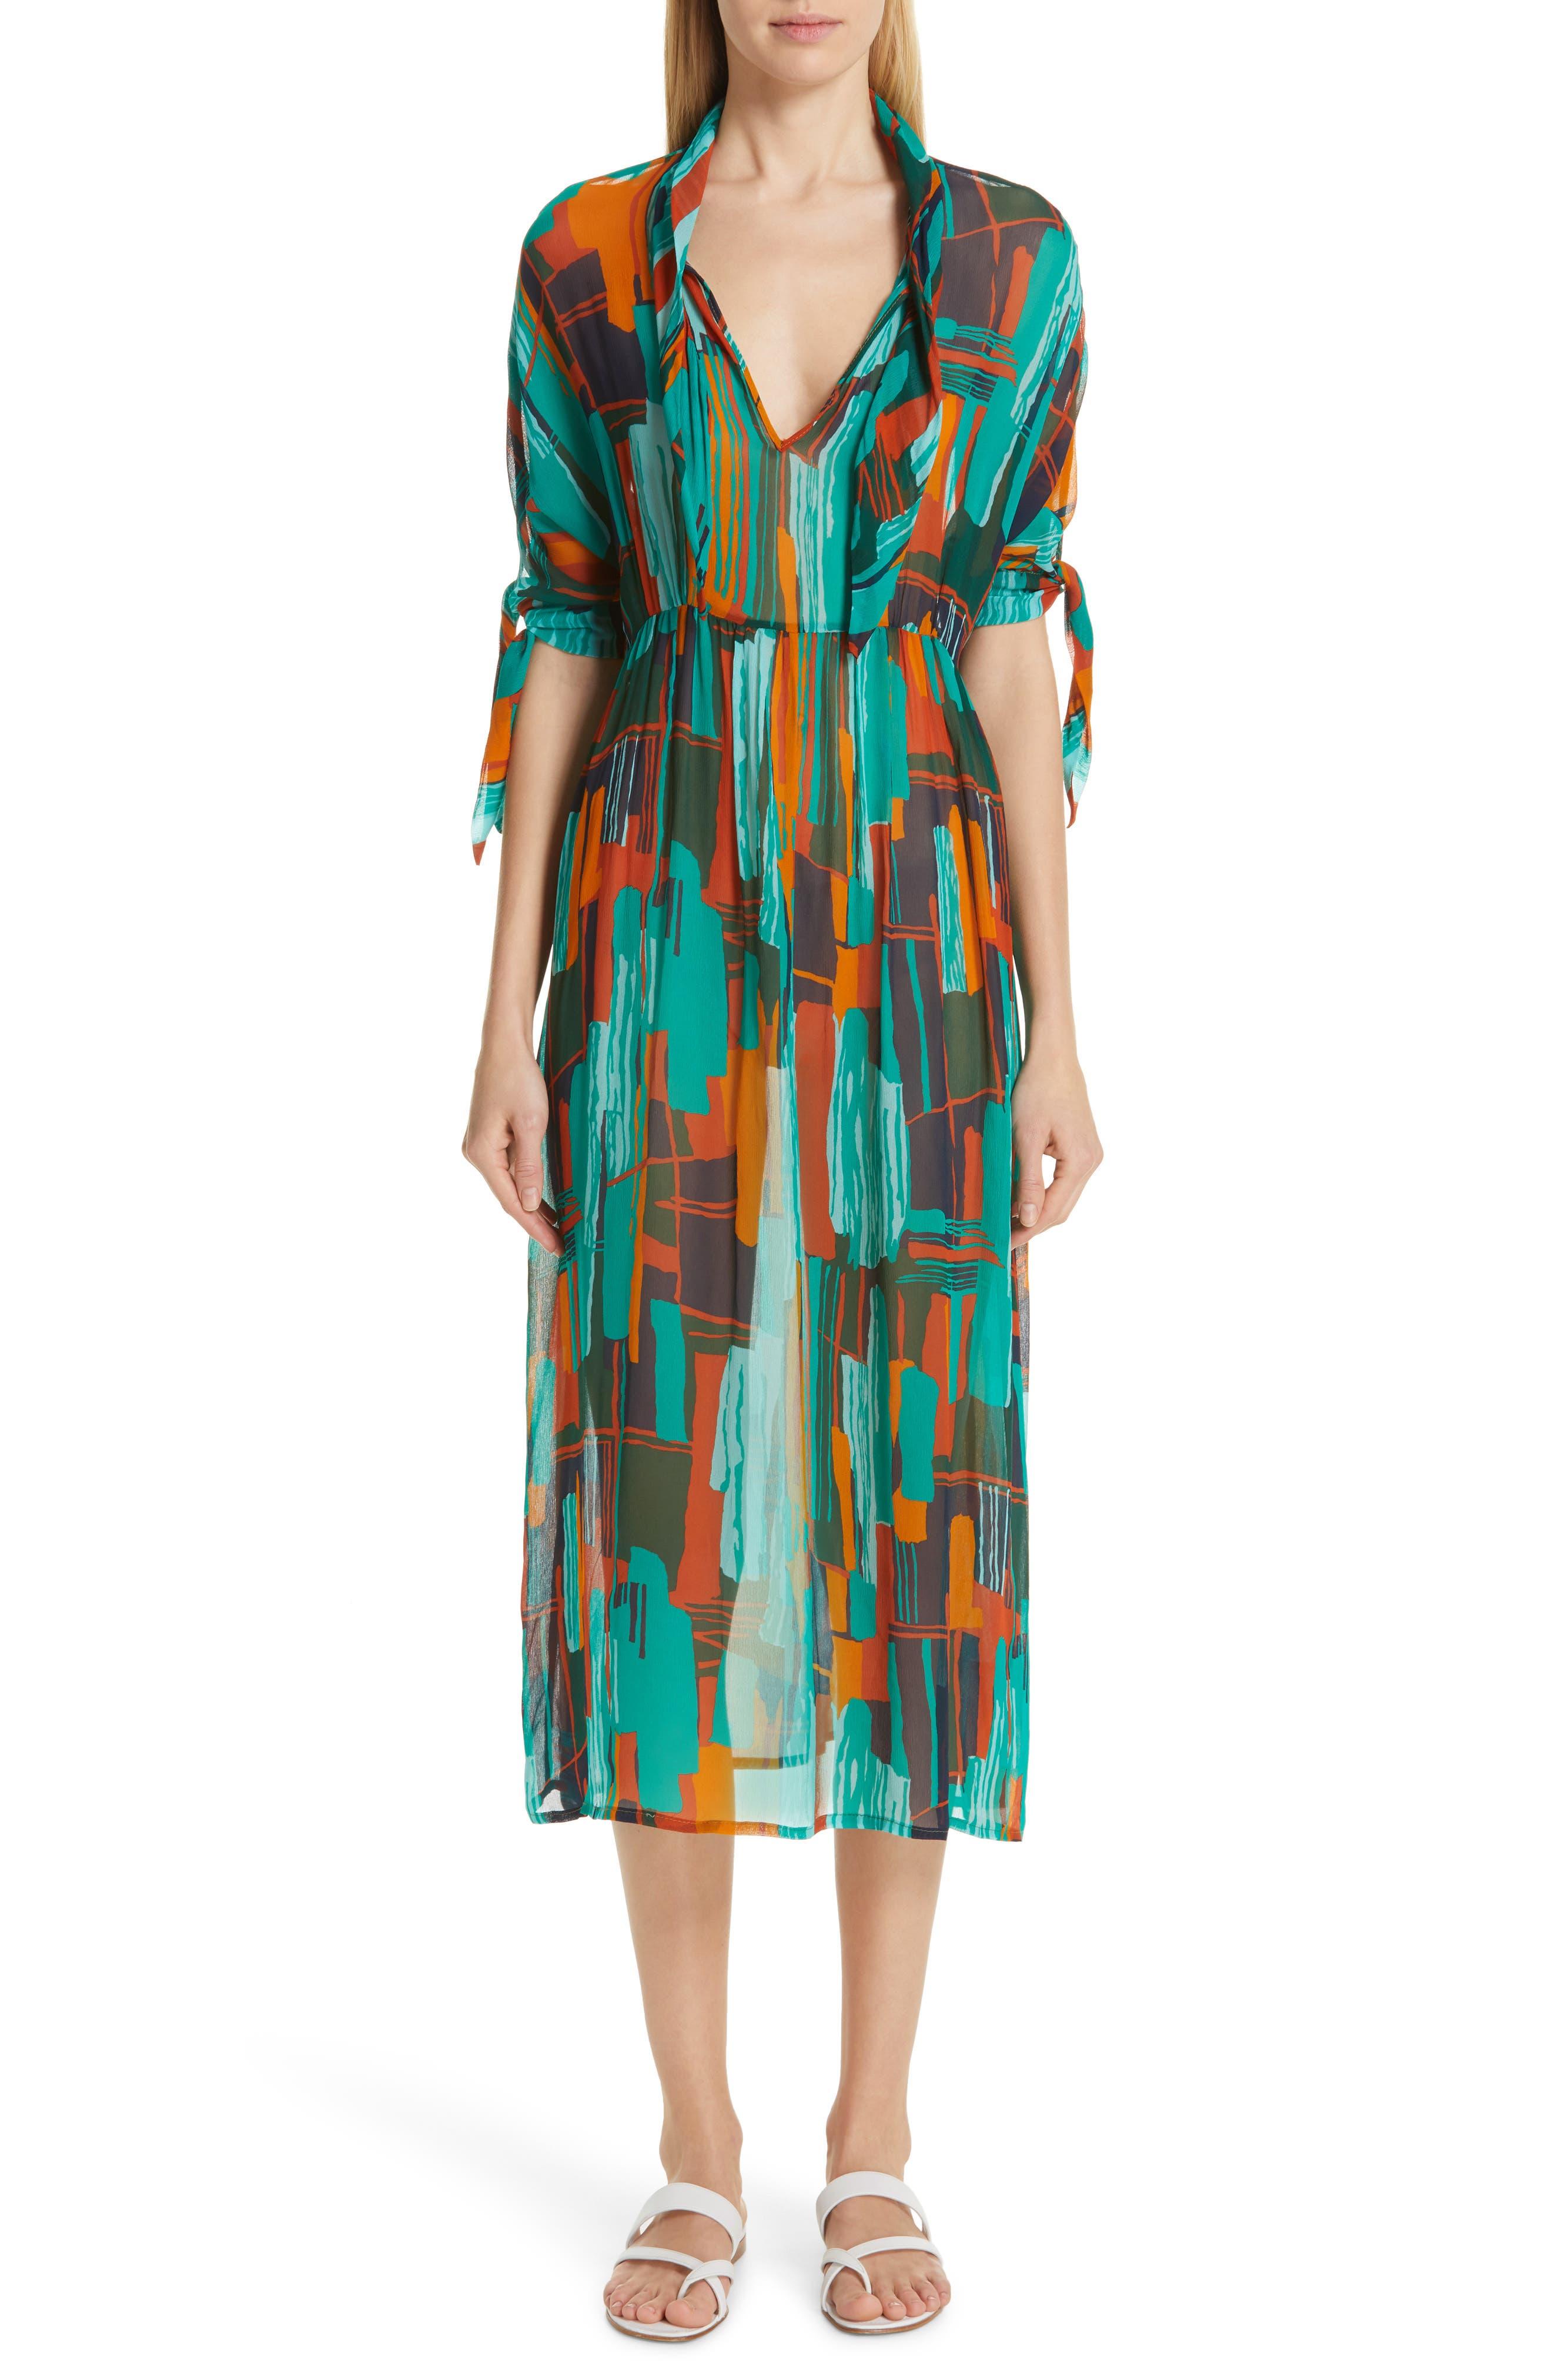 Roseanna Print Tie Neck Midi Dress, 8 FR - Green